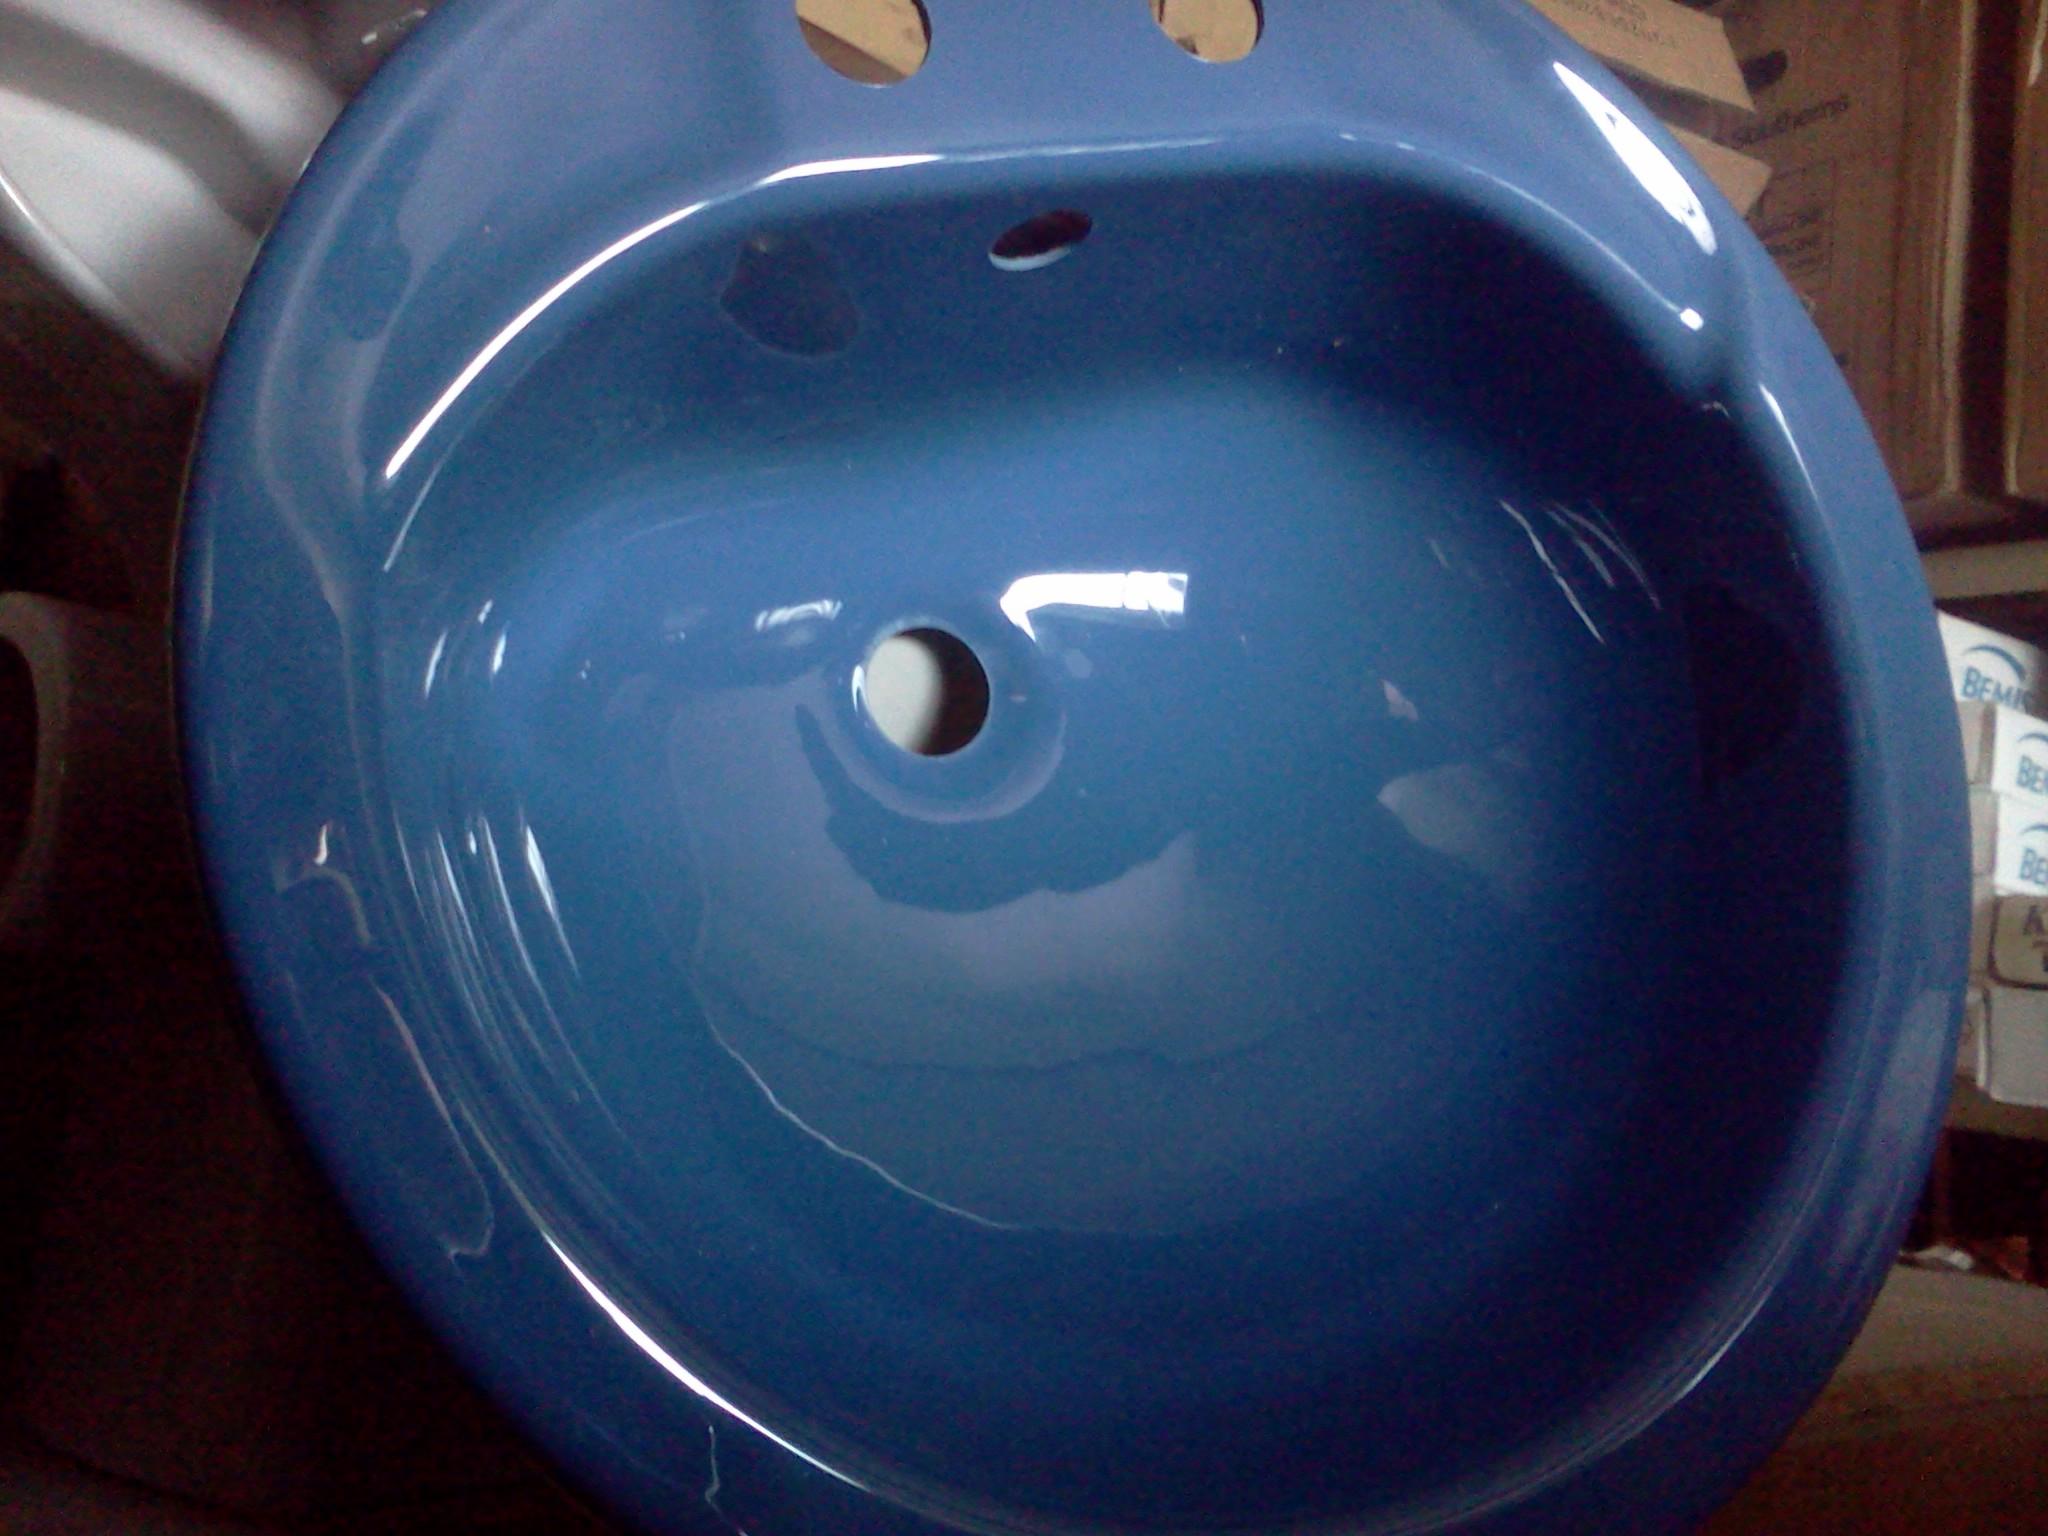 Sorrento Blue Colour Bathrooms UK Products Basins Toilets